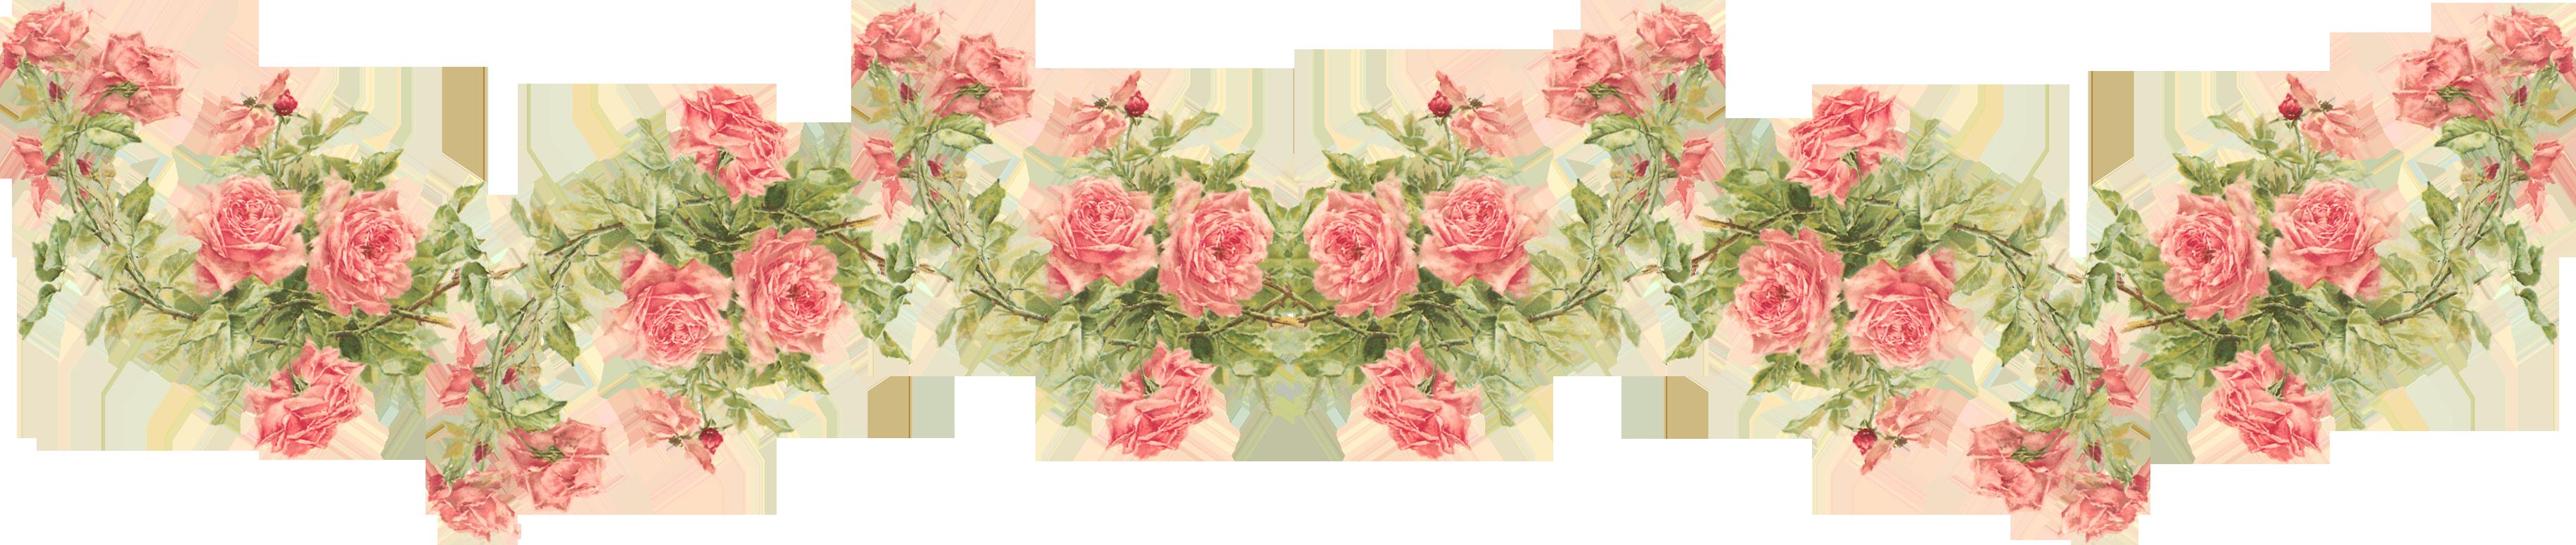 Png flower background hd. Garland clipart marigold